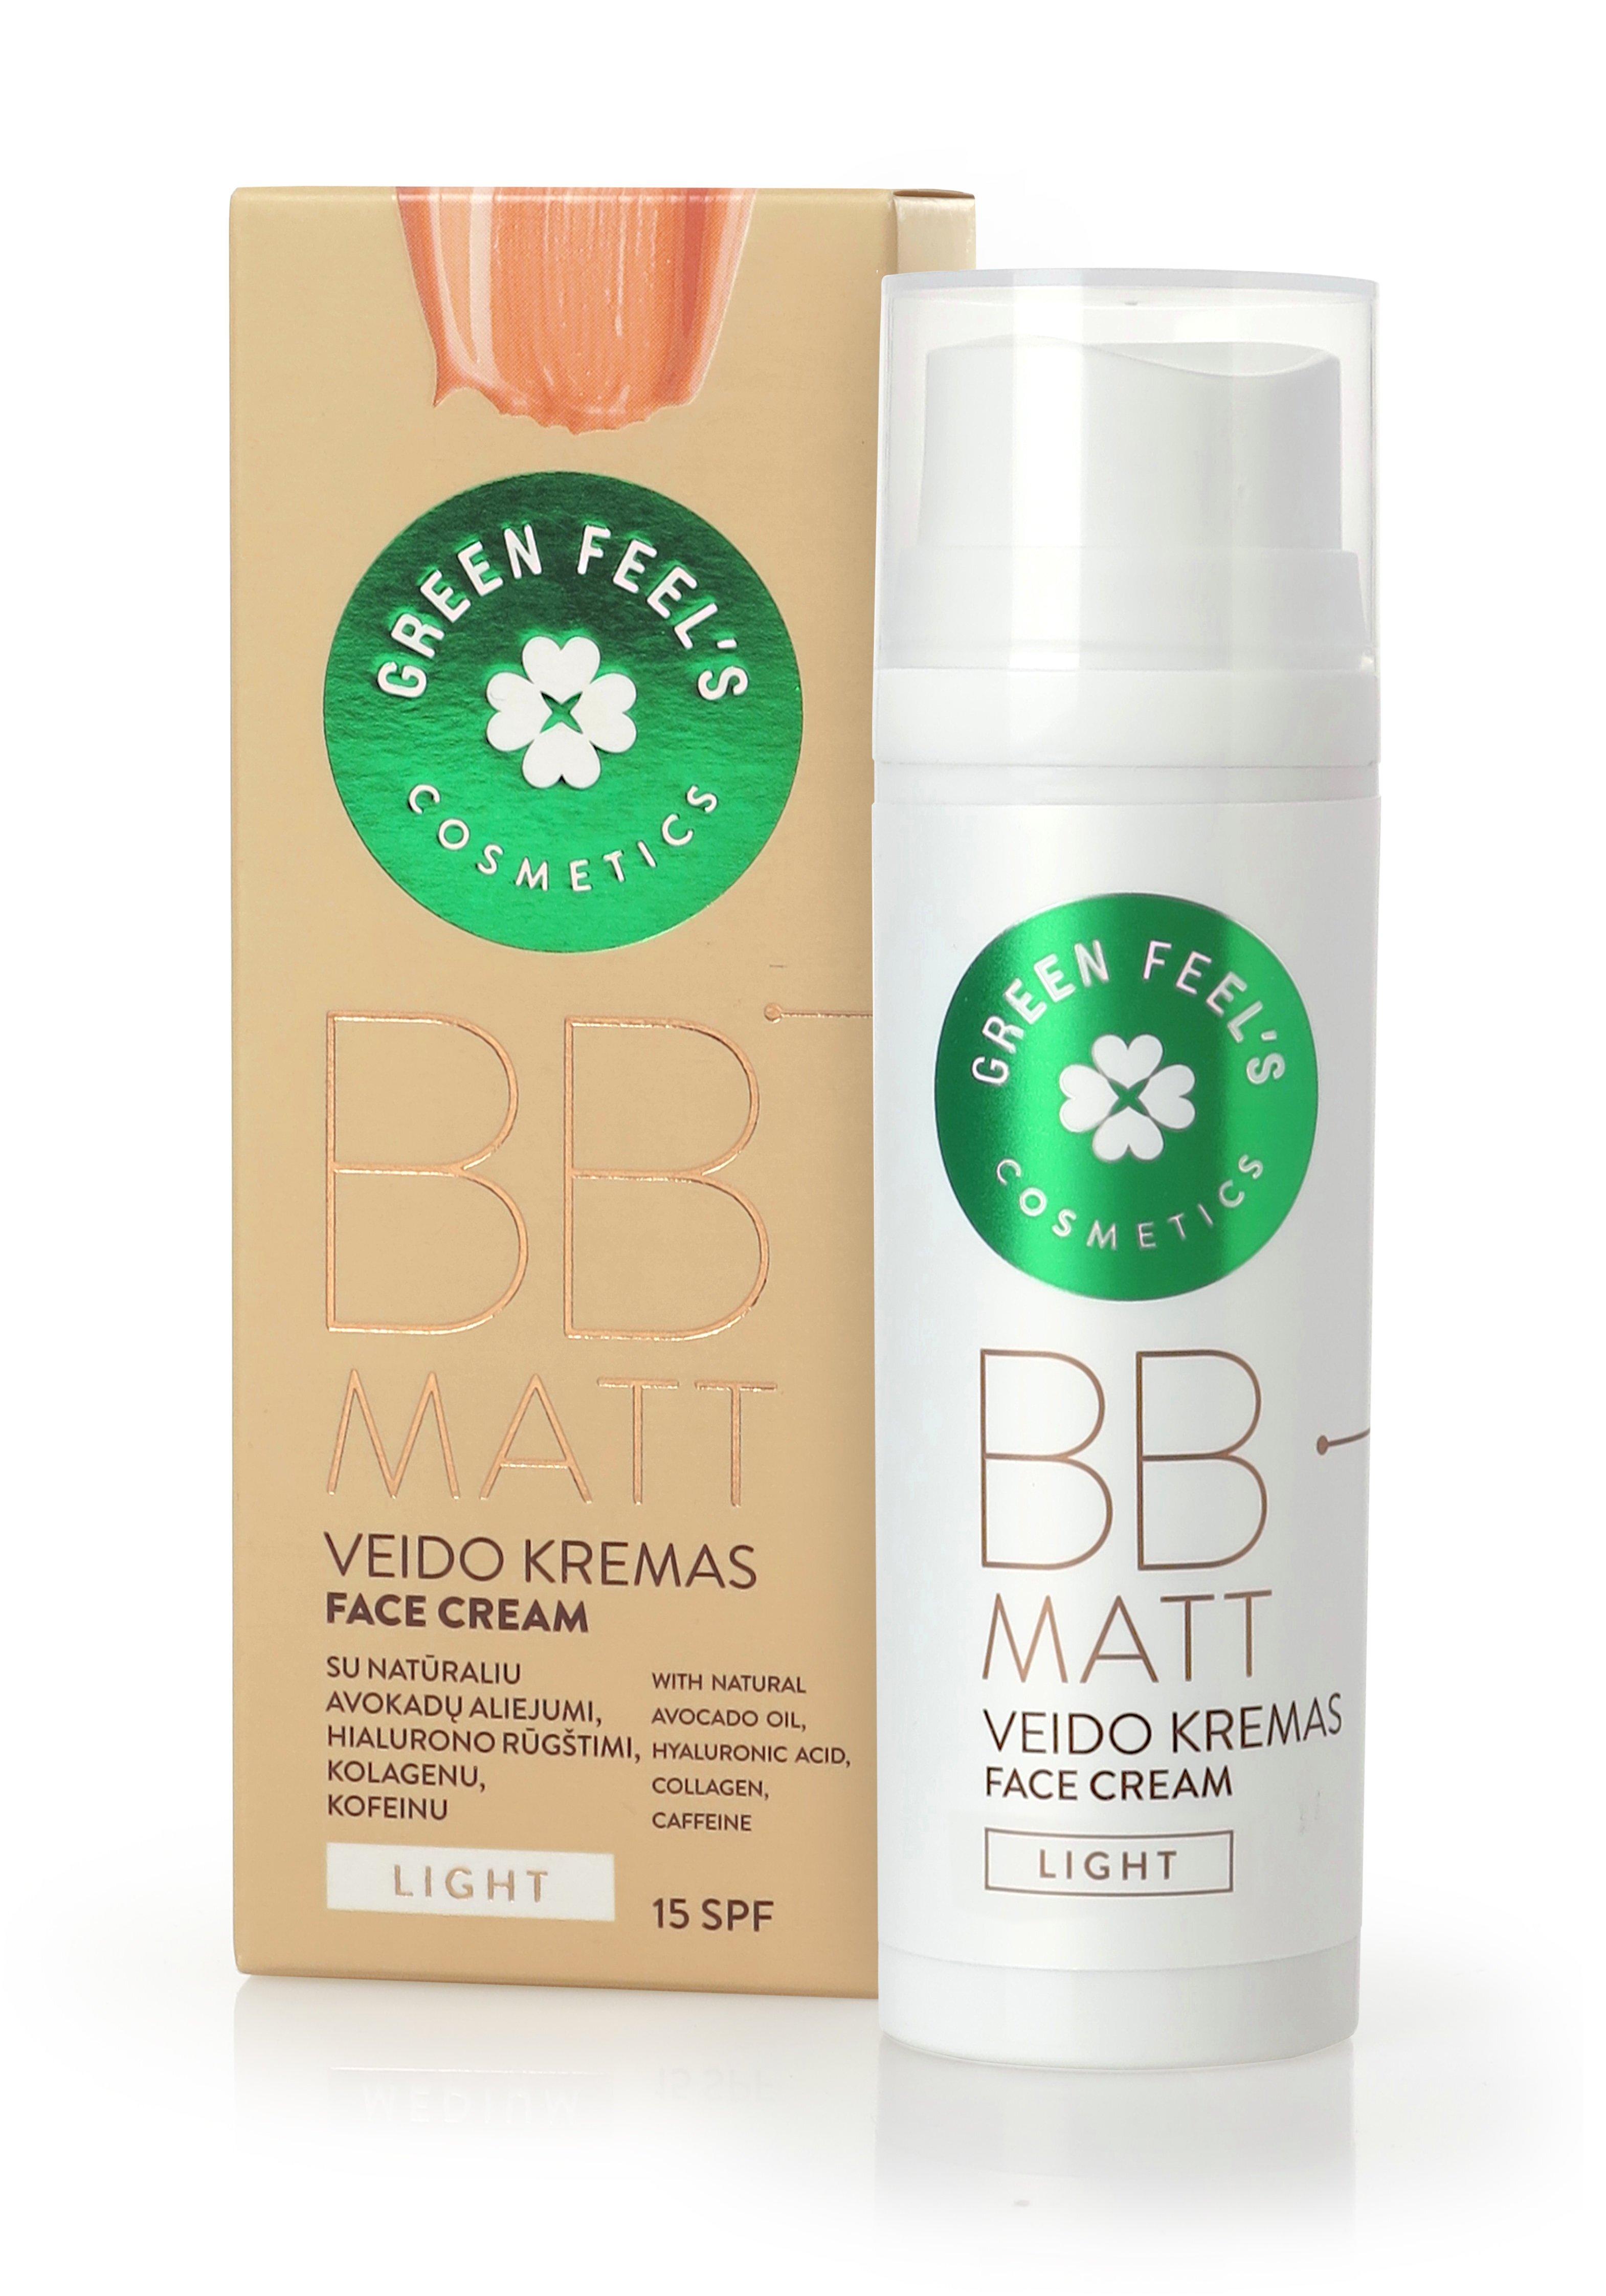 BB veido kremas Green feel's 50 ml Light